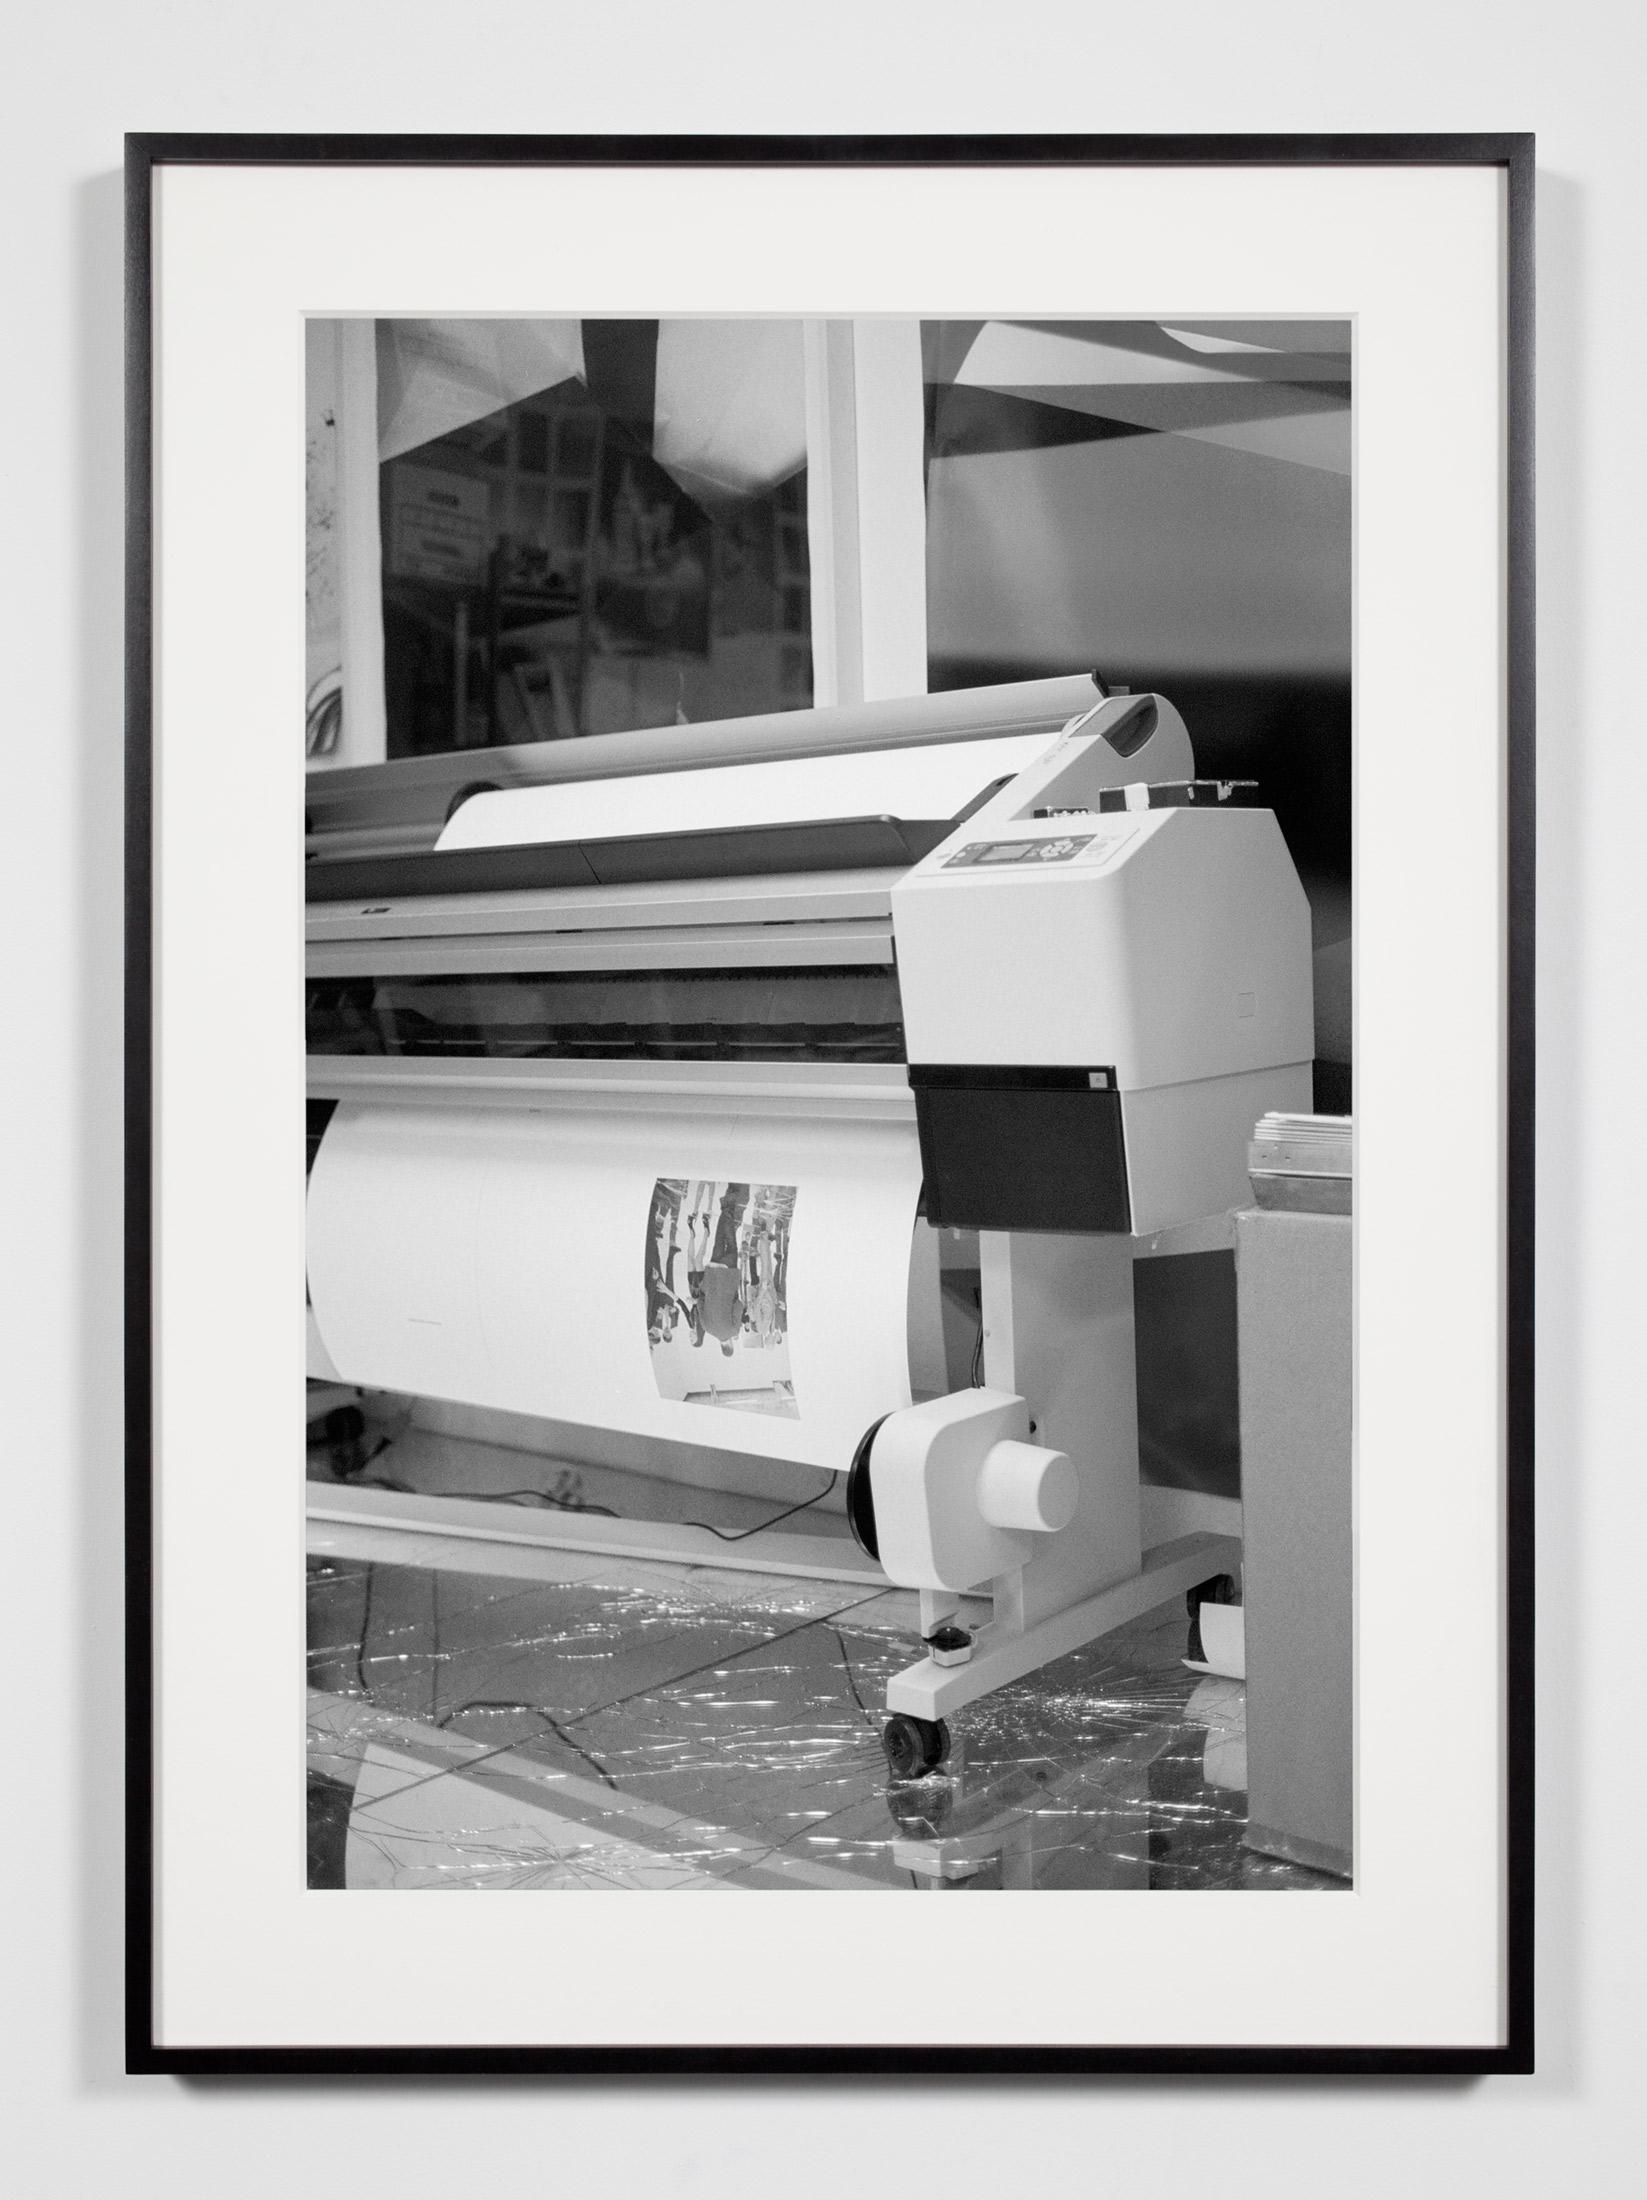 Artist Studio, Wide-Format Inkjet Printer, Los Angeles, California, December 9, 2010    2011   Epson Ultrachrome K3 archival ink jet print on Hahnemühle Photo Rag paper  36 3/8 x 26 3/8 inches   Industrial Portraits, 2008–